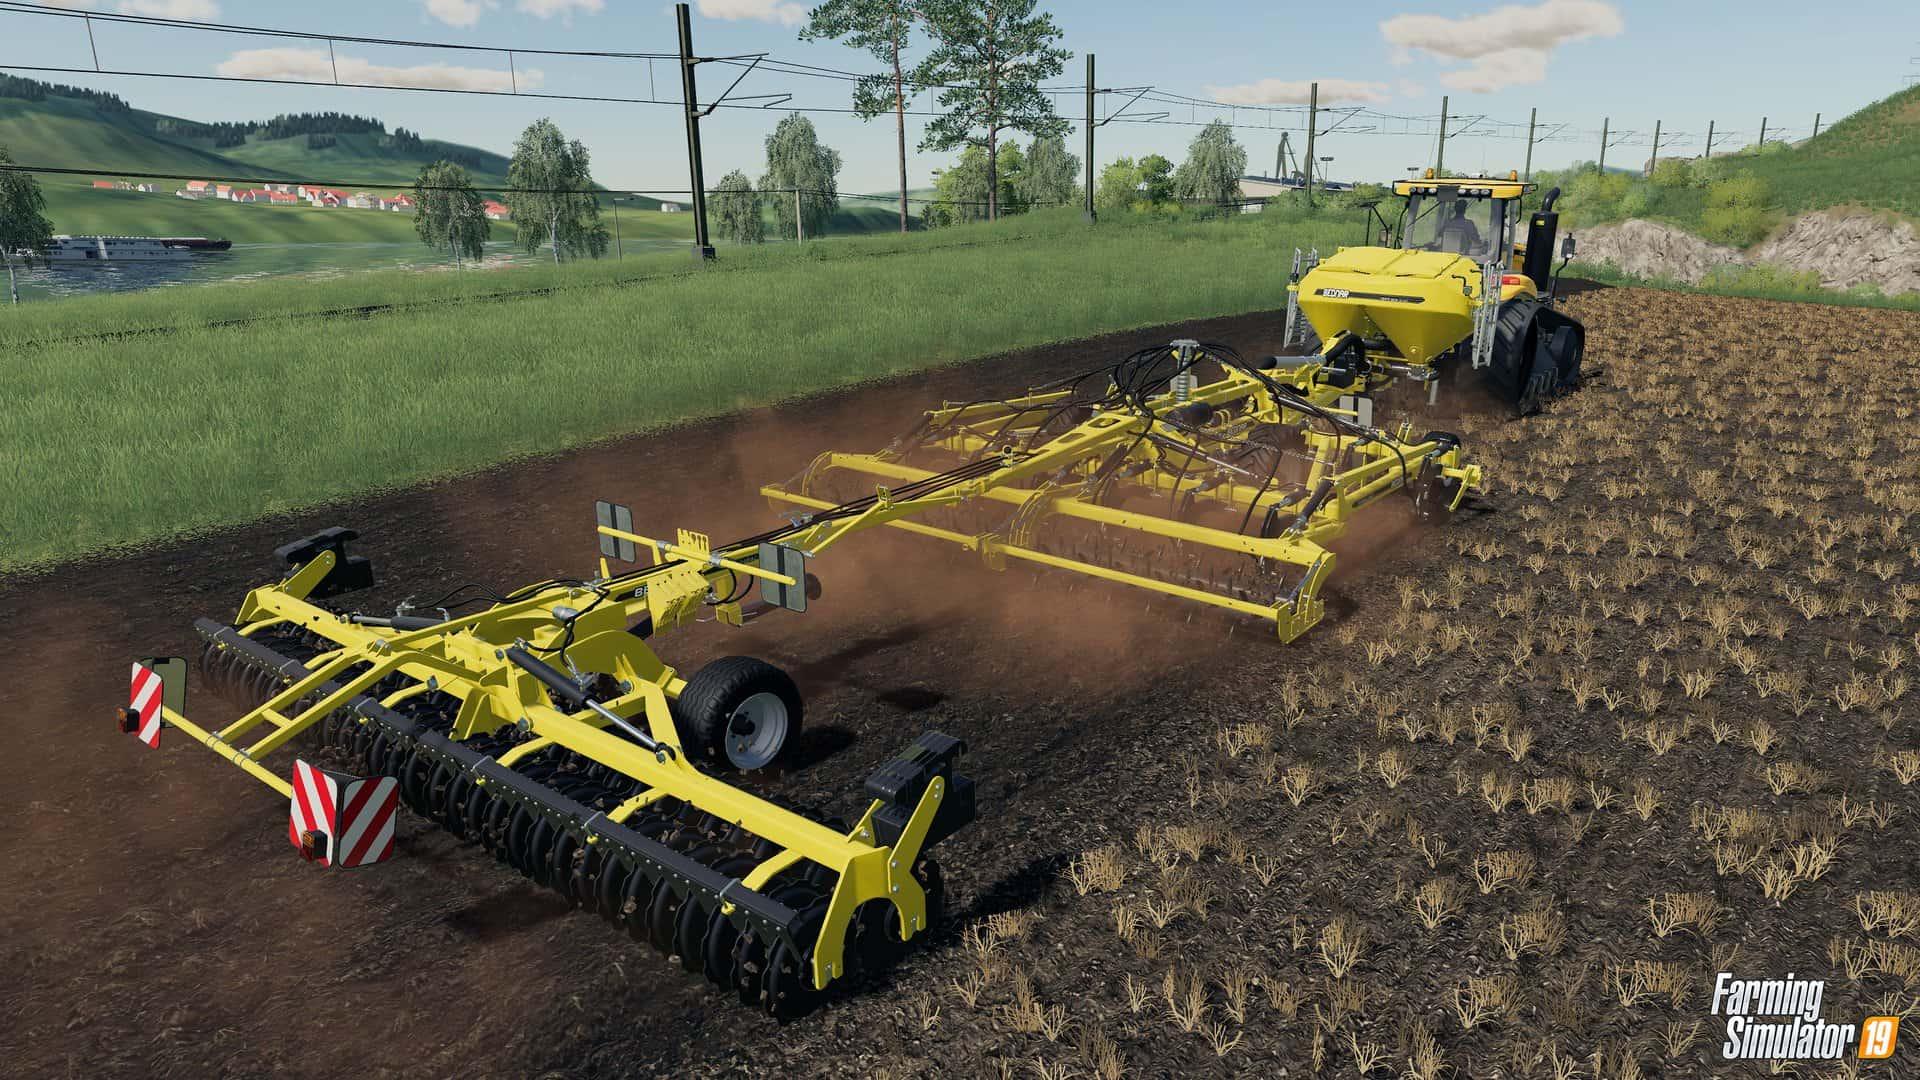 Farming Simulator 19 will include BEDNAR FMT - Farming Simulator 19